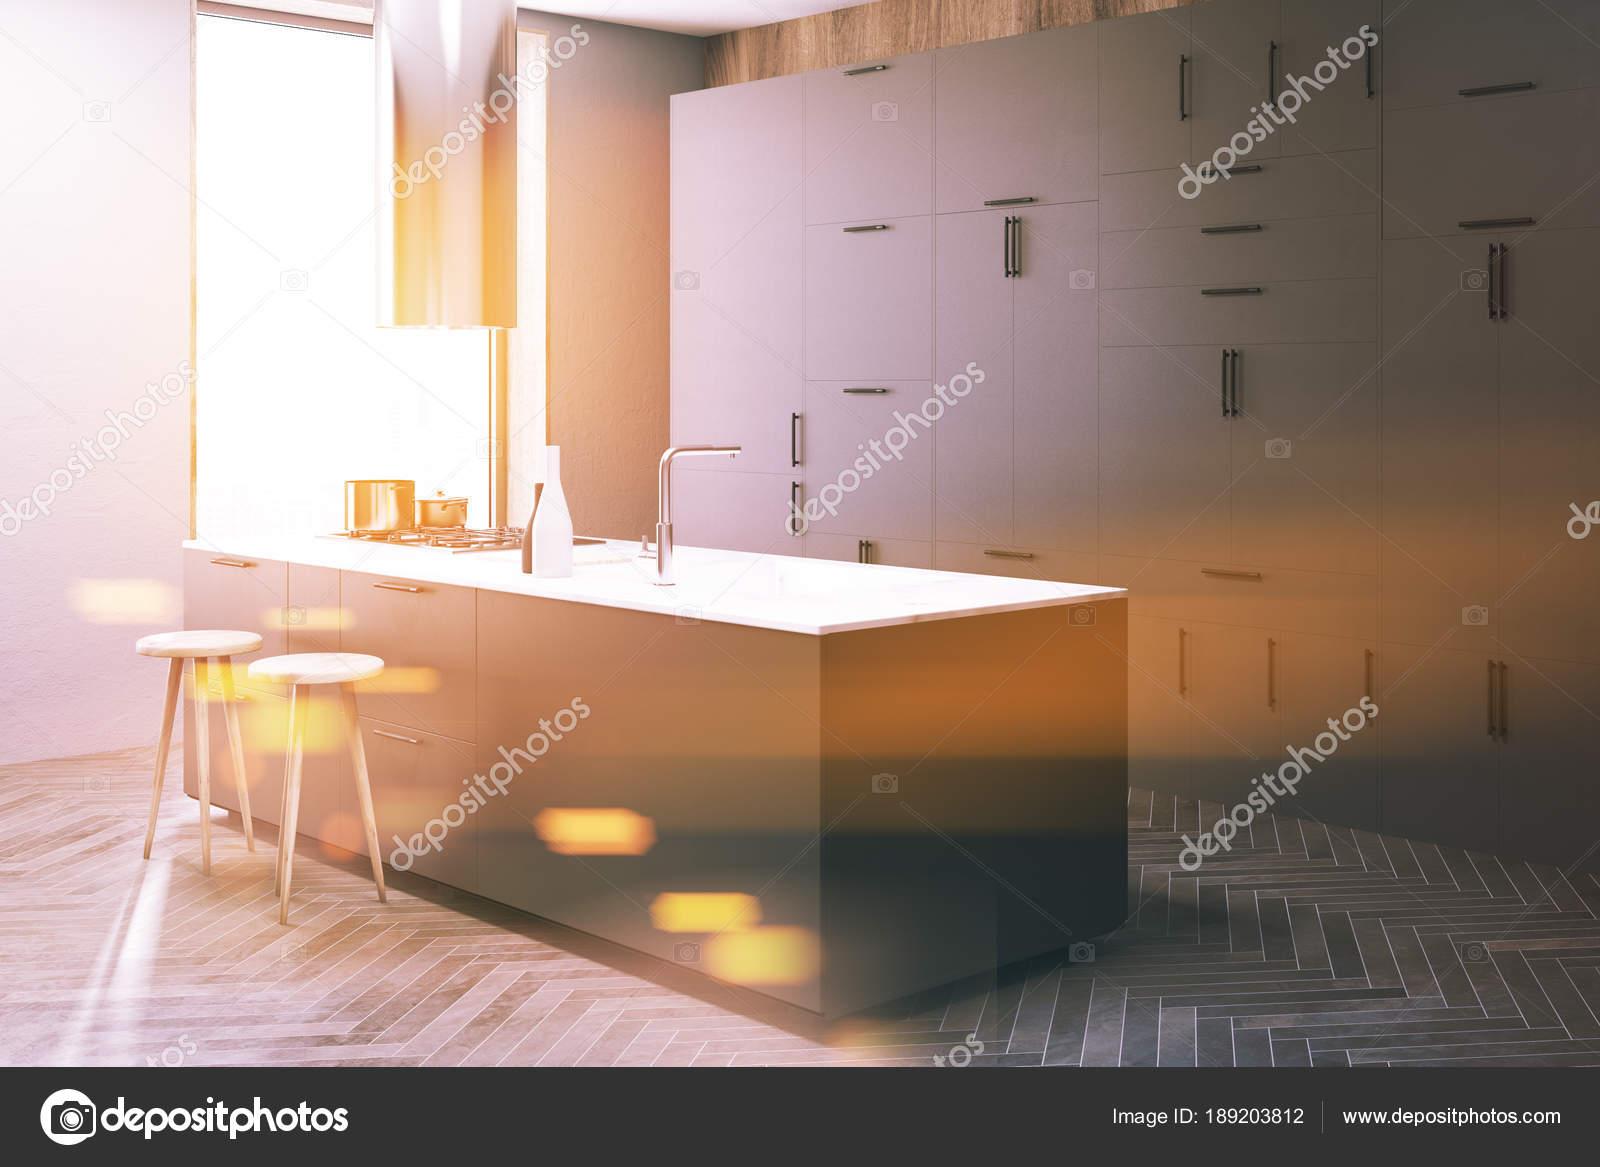 pub kitchen table grey modern cabinets 深灰色厨房角落 酒吧色调 图库照片 c denisismagilov 189203812 木墙阁楼厨房角落与木地板 和深灰色台面 有凳子的桌子 3d 渲染模拟色调图像 照片作者denisismagilov